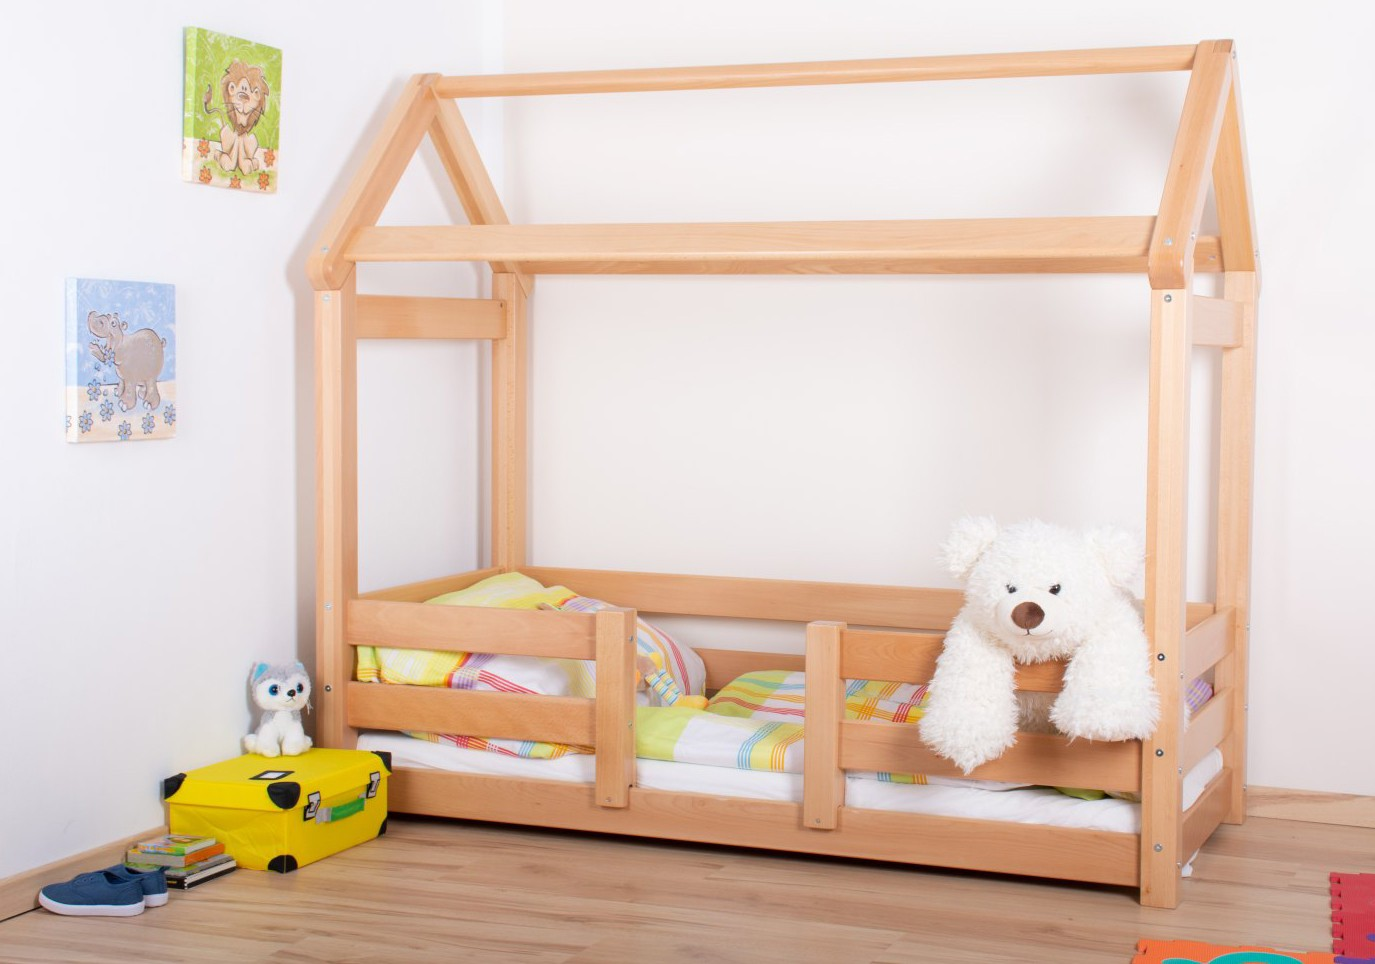 Full Size of Hausbett 100x200 Kinderbett 01 Buche Massiv Natur Bett Weiß Betten Wohnzimmer Hausbett 100x200